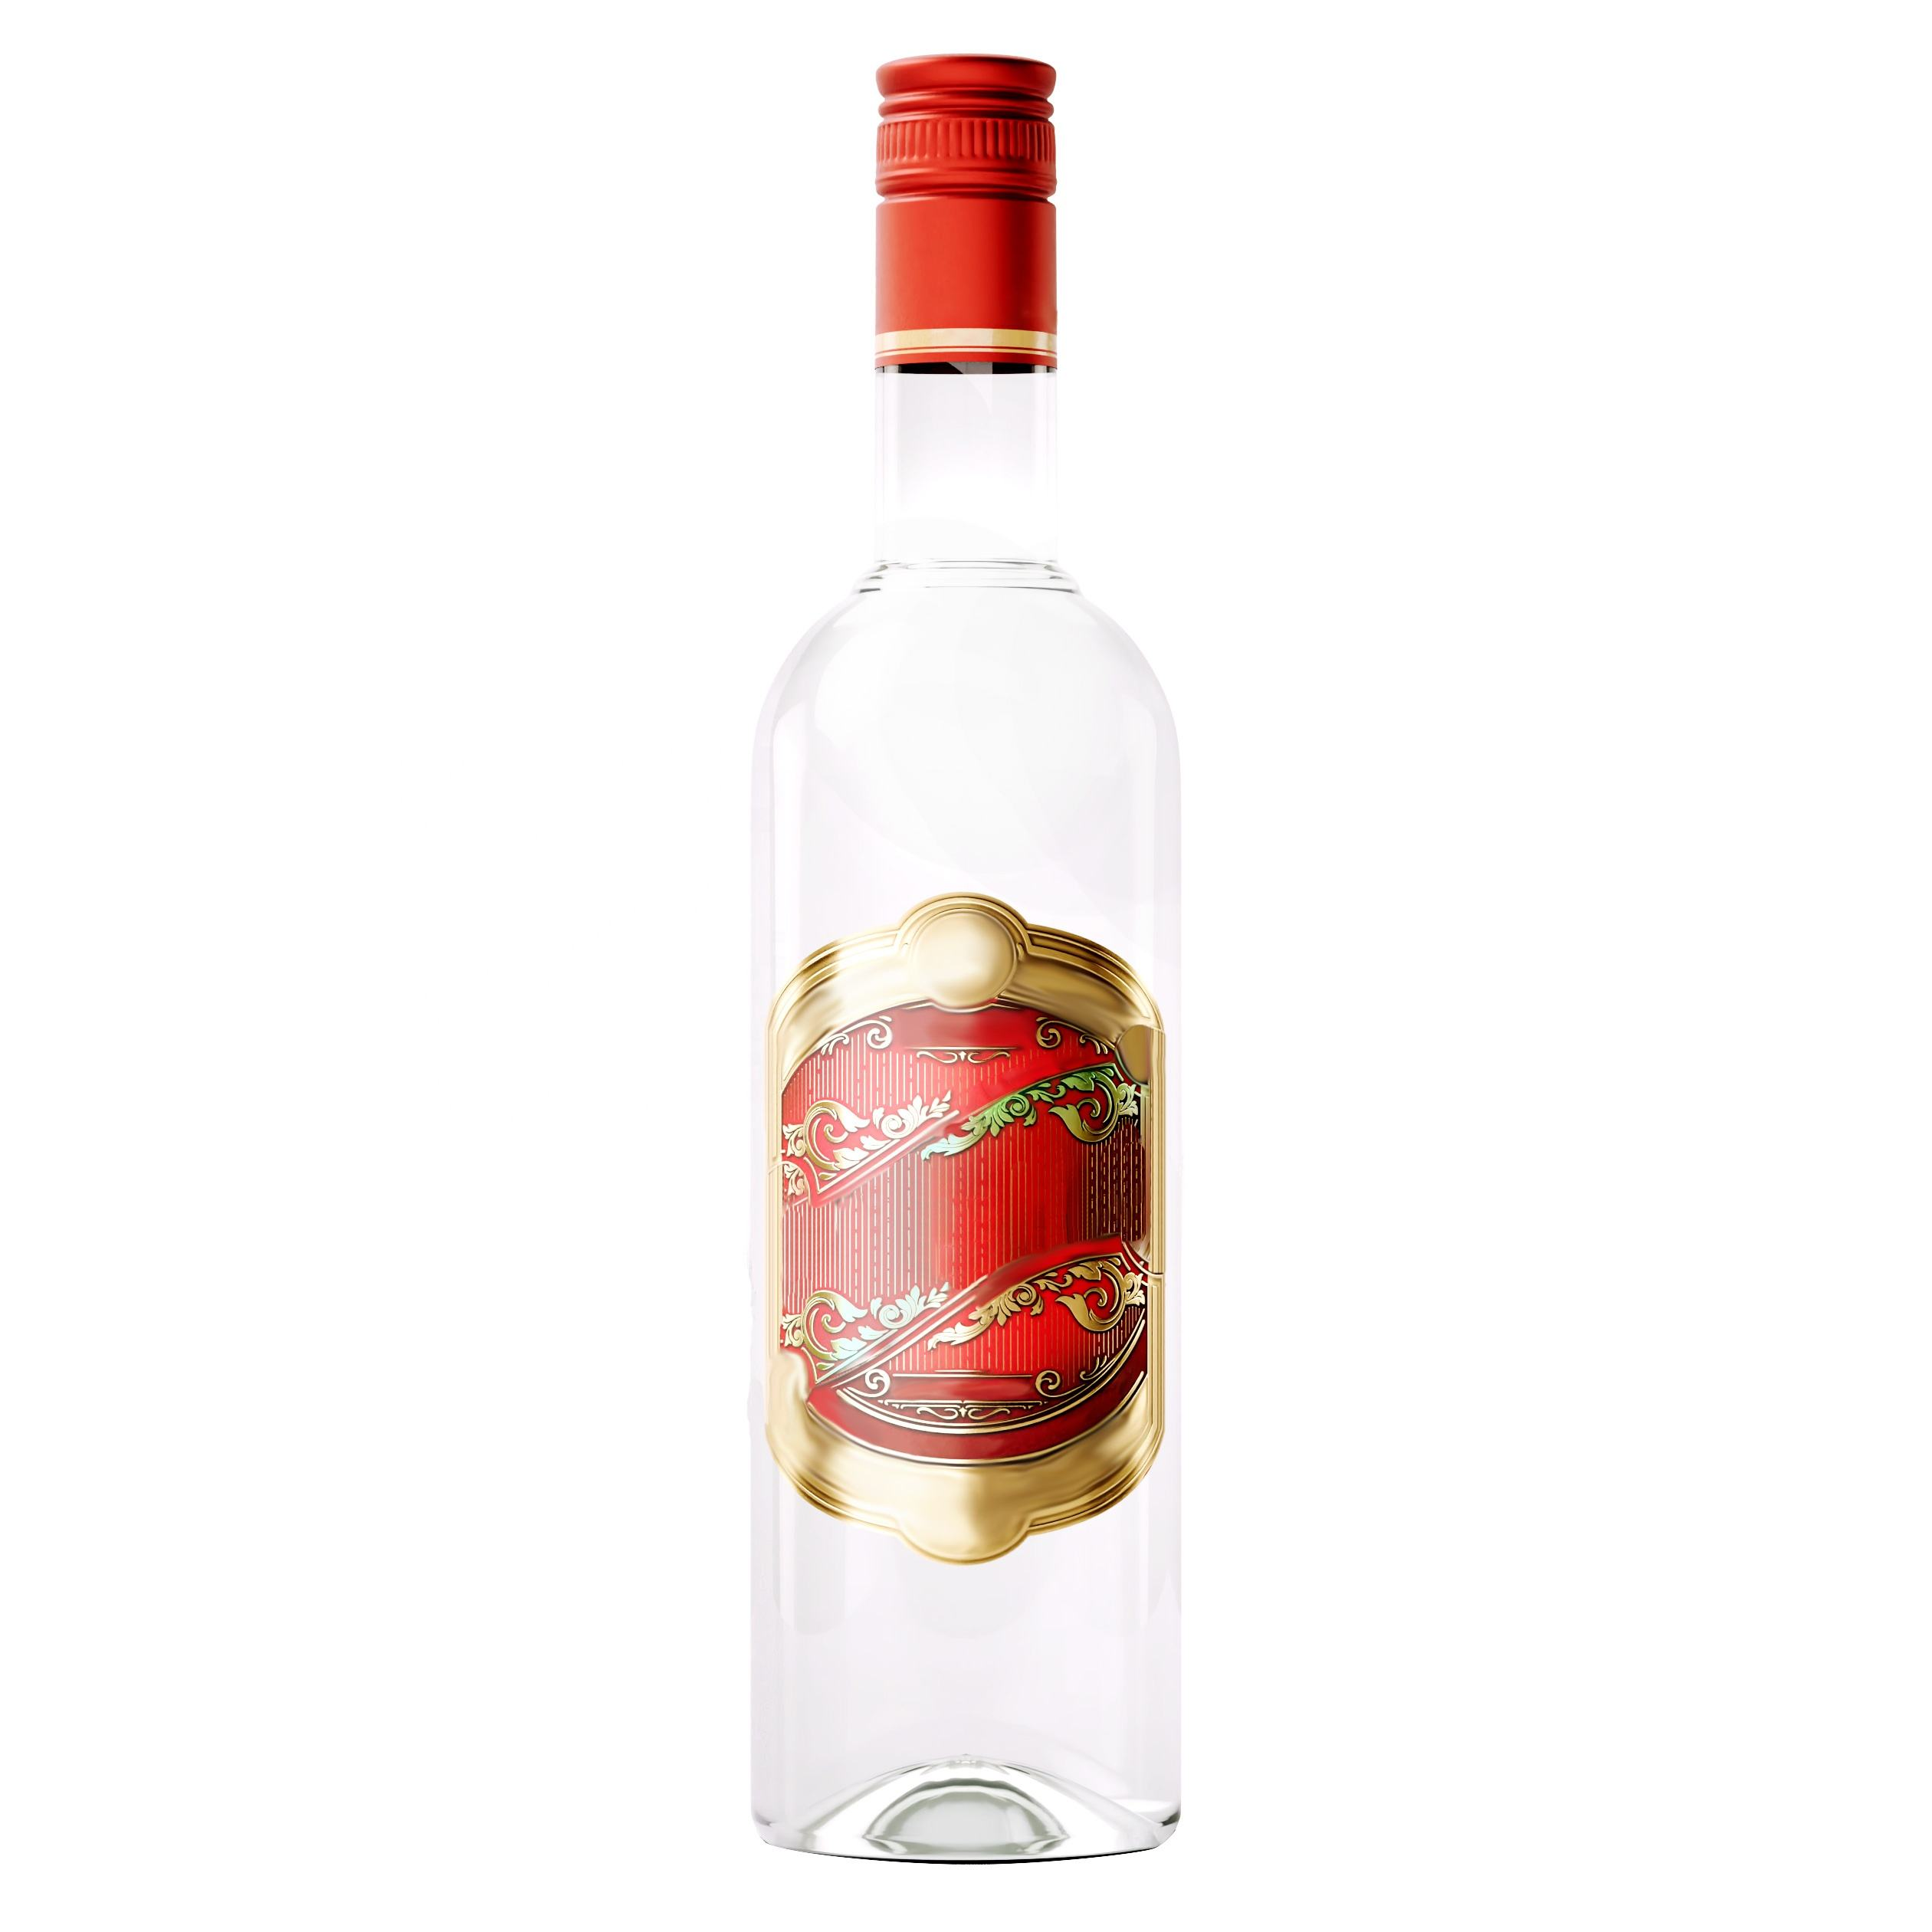 Premium Quality Russian 40% OEM Custom Vodka Based on Lux Spirit, 500 ml